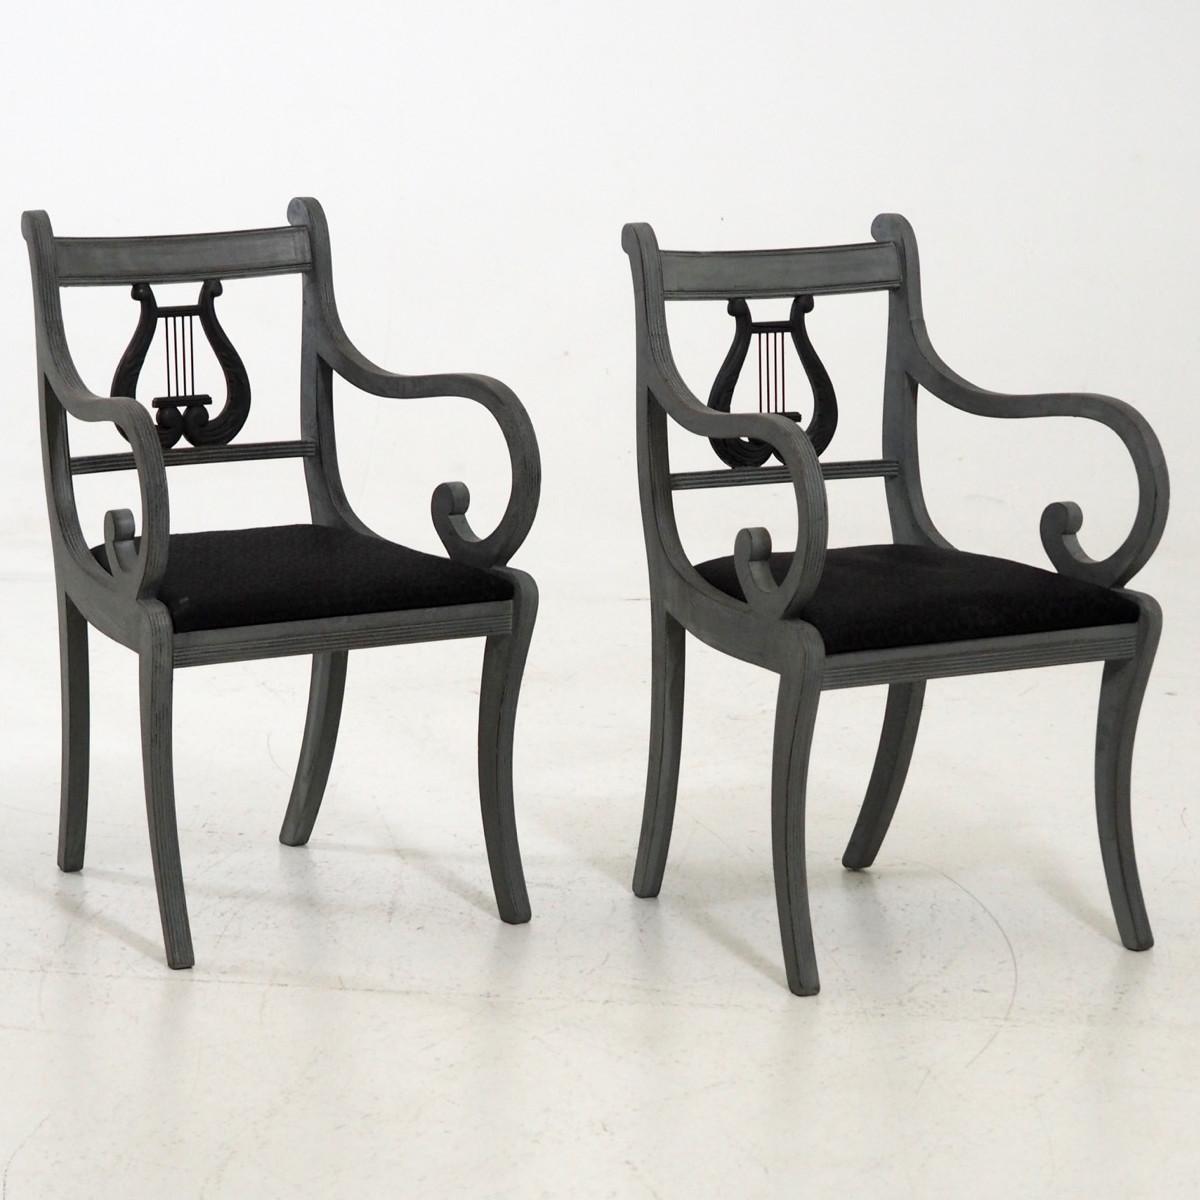 Lyre chairs.jpg